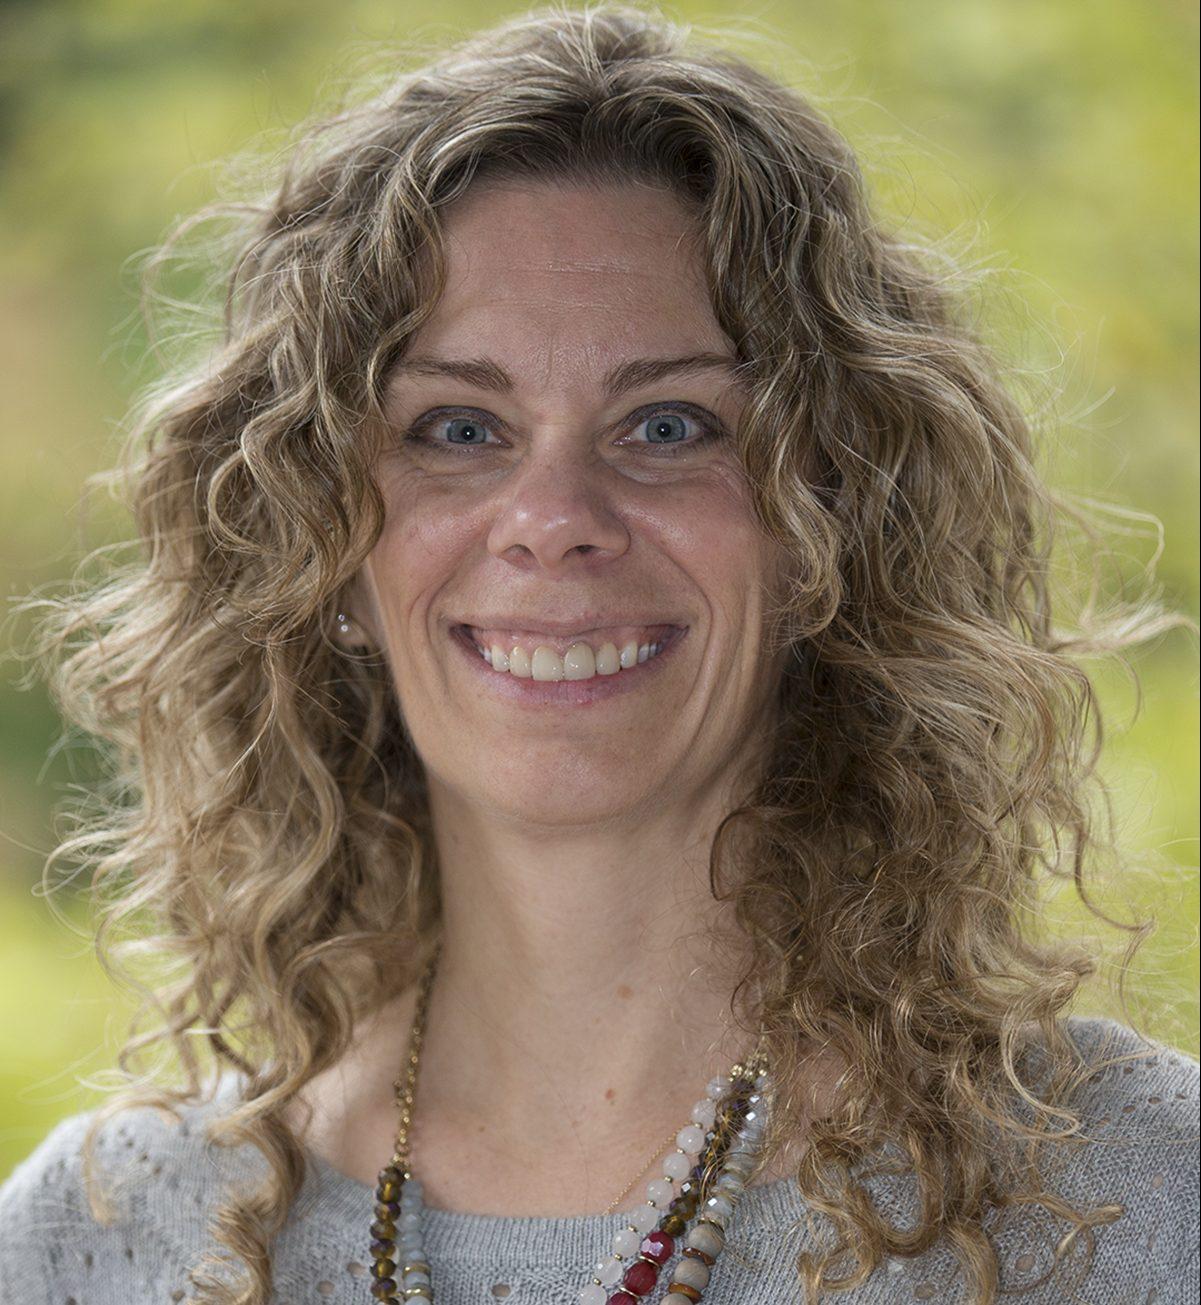 Rae Buckley